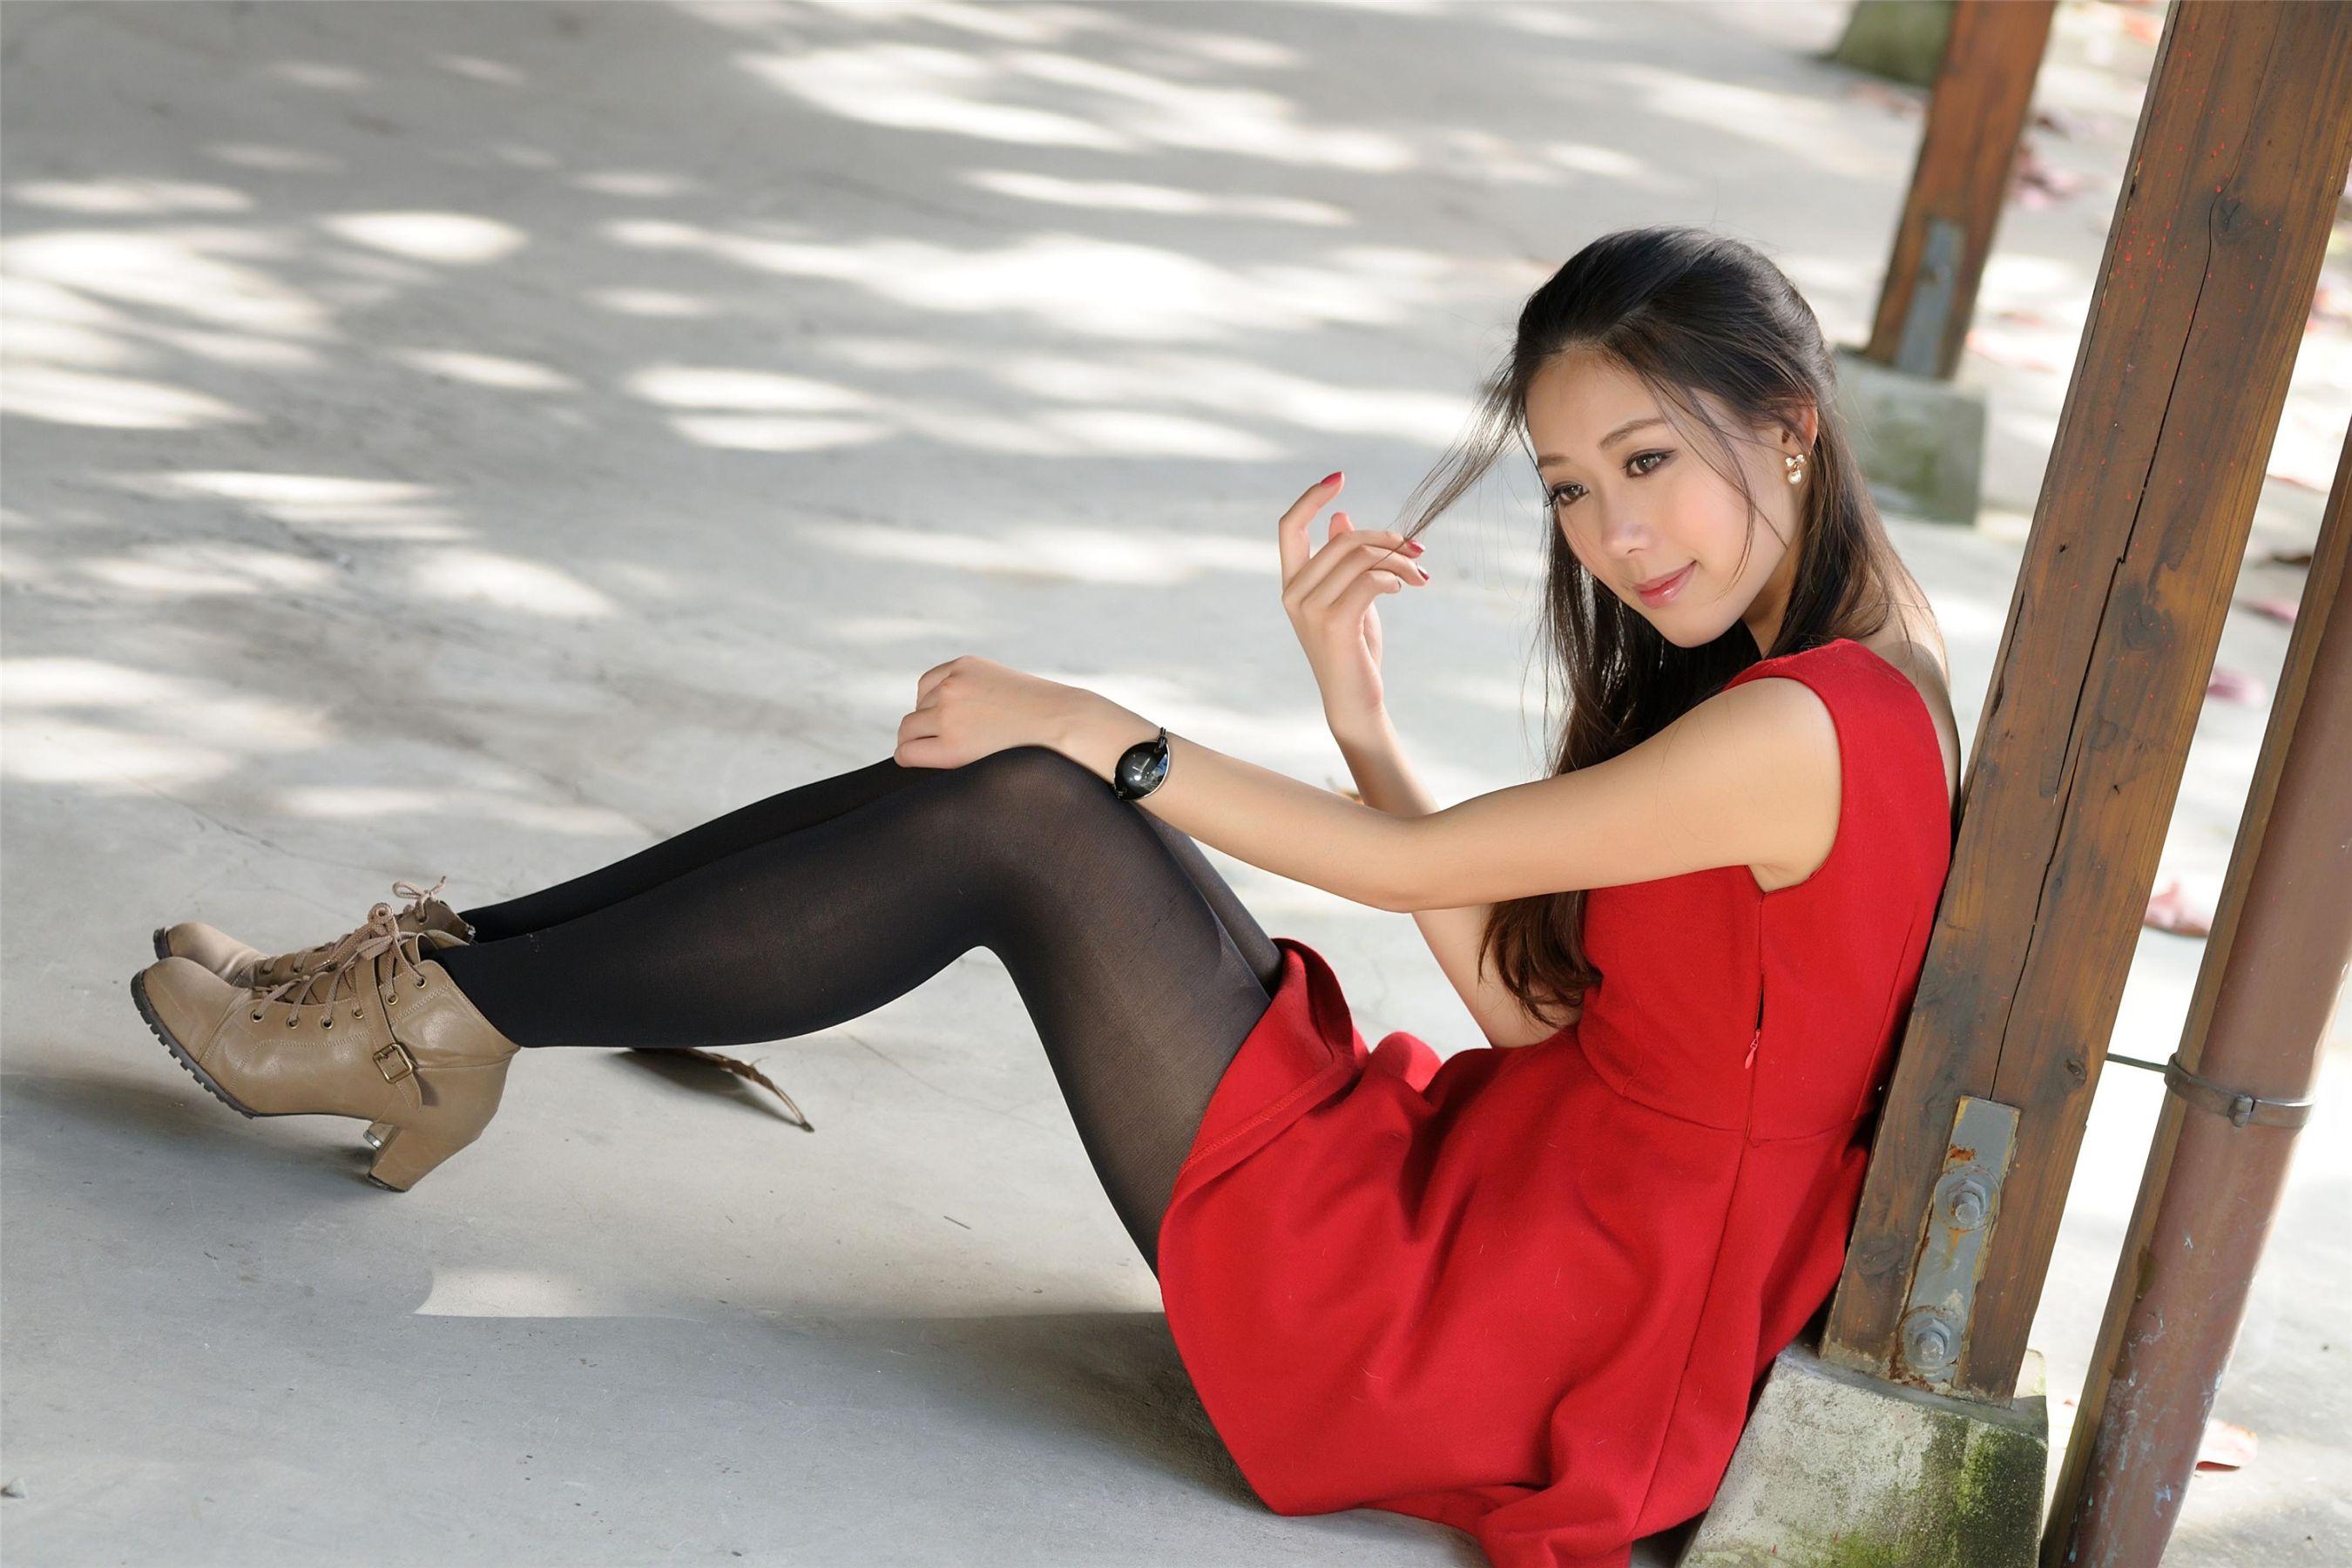 VOL.1430 [台湾正妹]清纯甜美女神正妹优雅美女长发美女:佳贝儿高品质写真套图(40P)